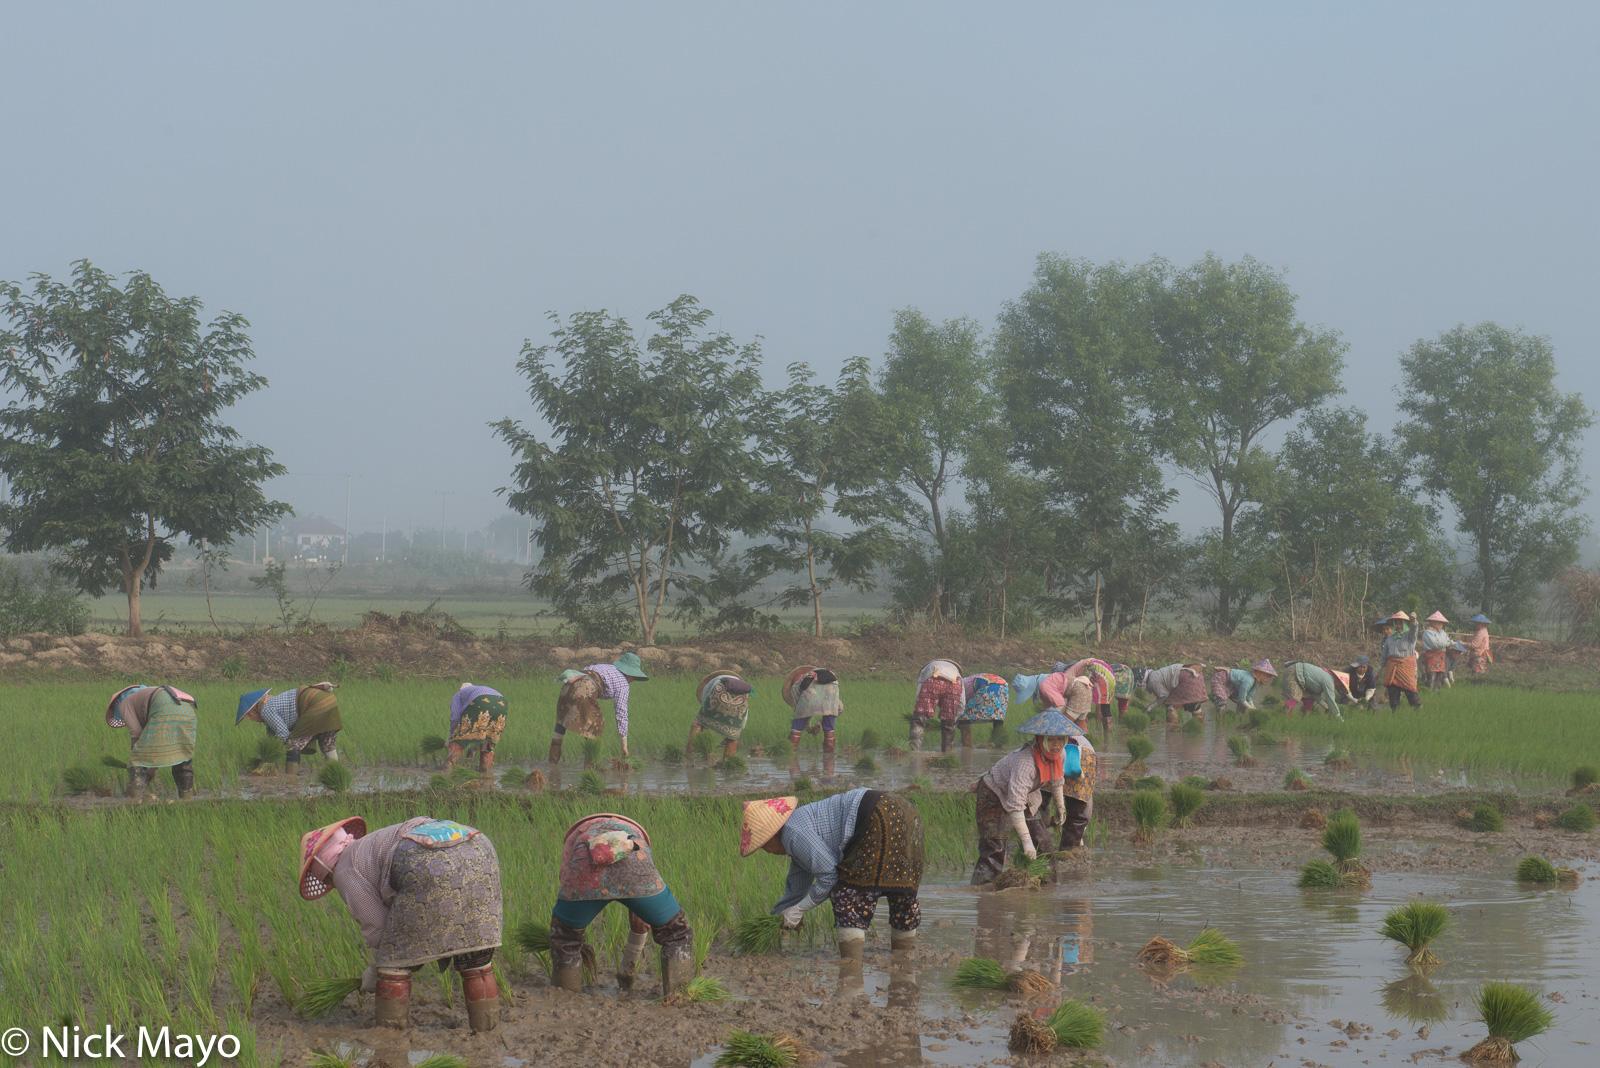 A large group of Shan women transplanting paddy rice near Kalaw.